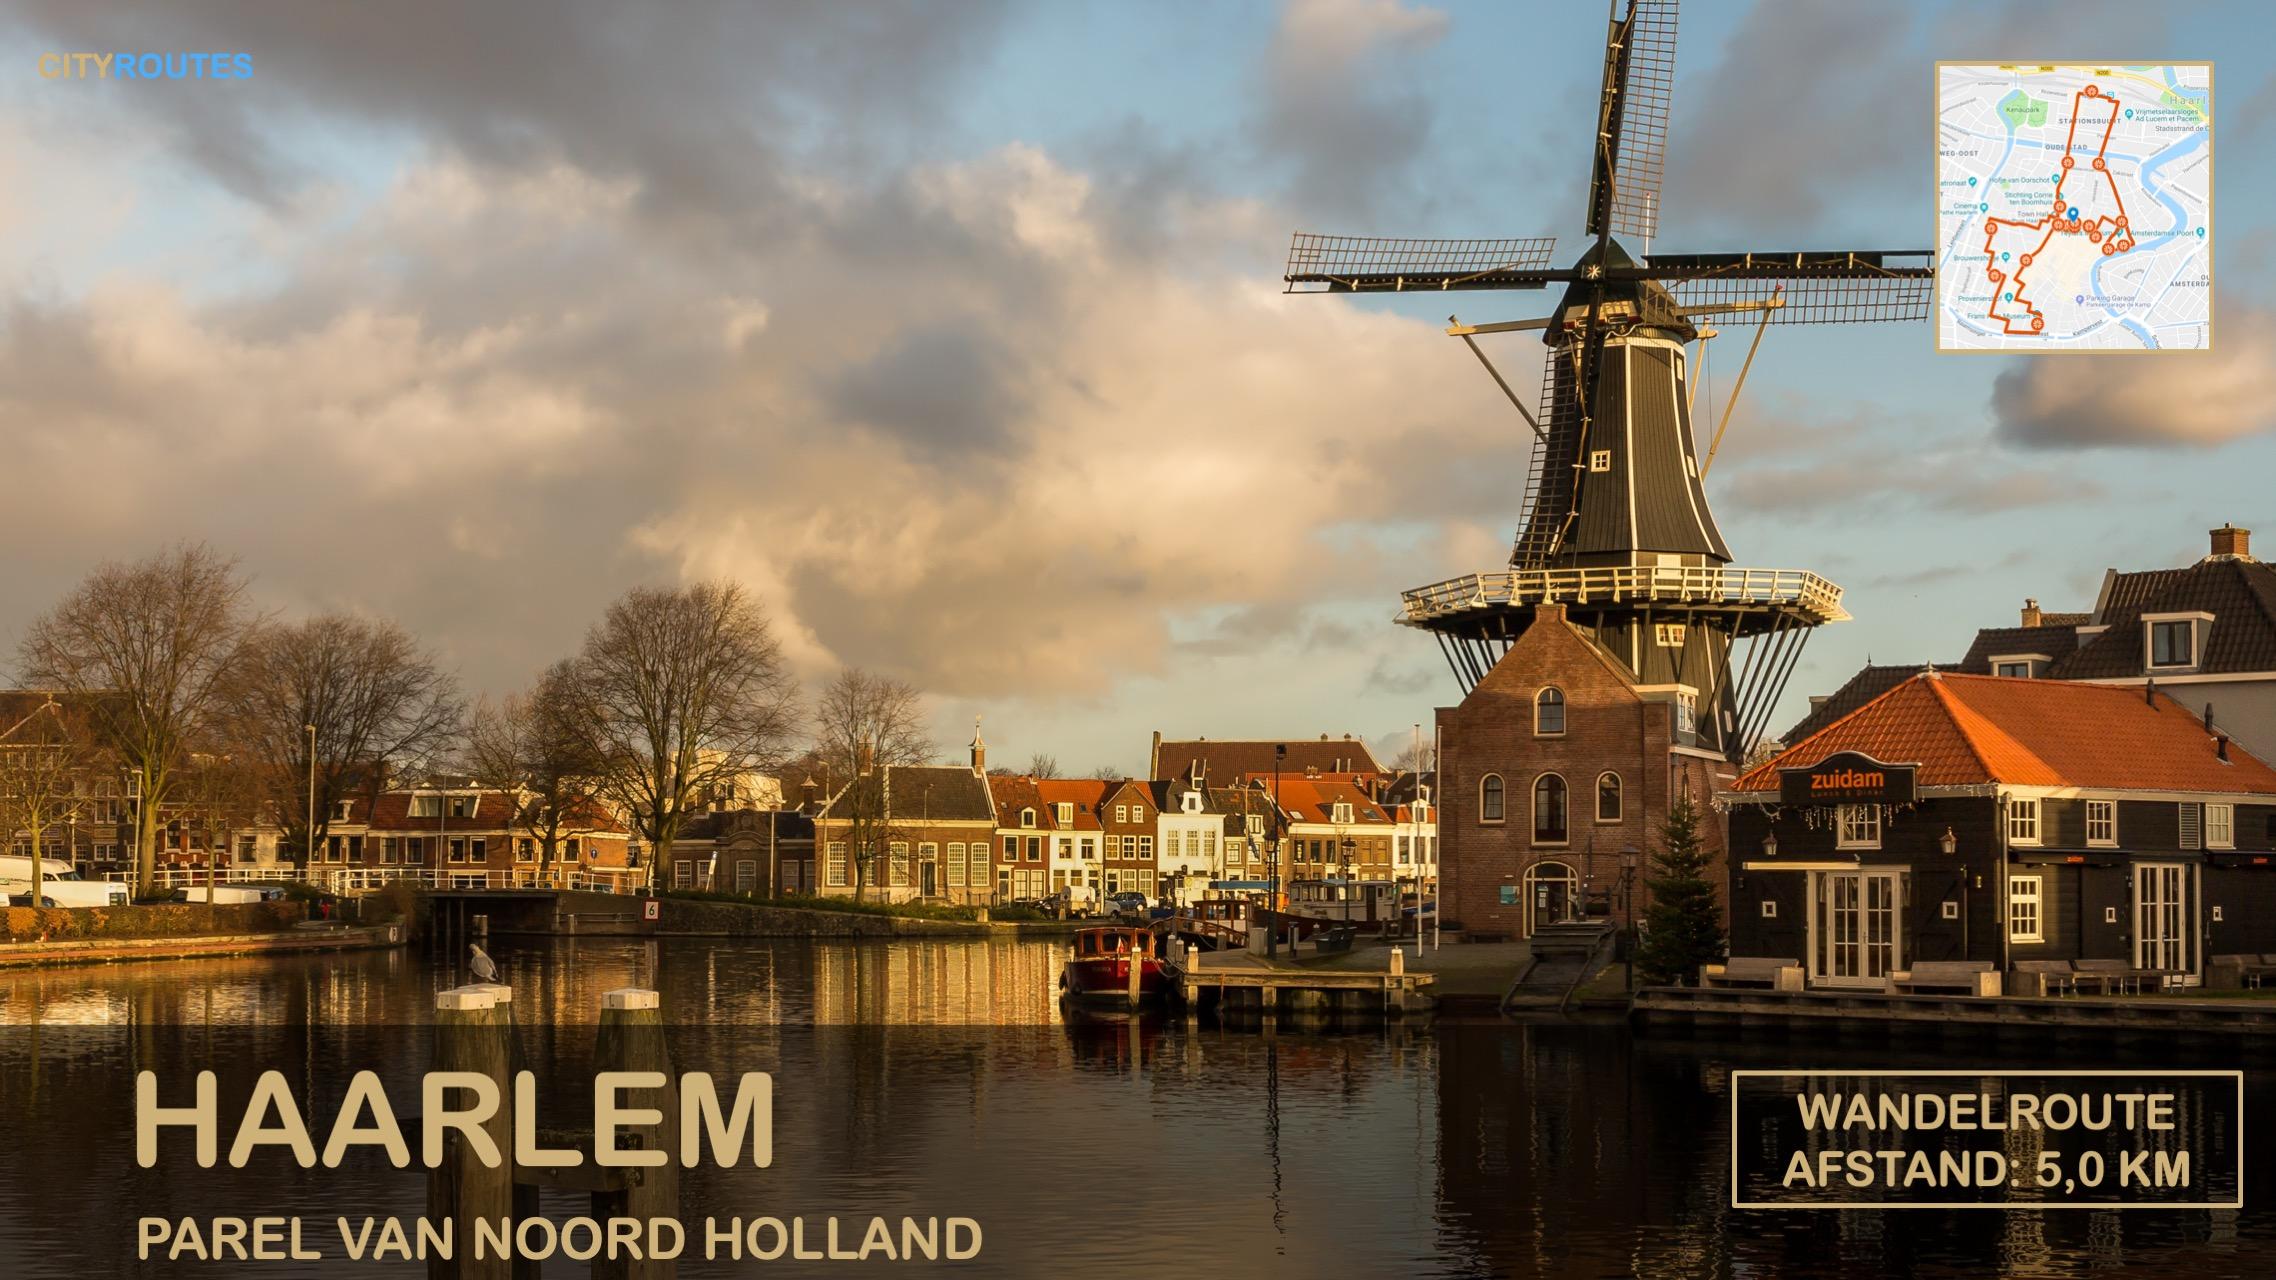 Gratis stadswandeling Haarlem Cityroutes